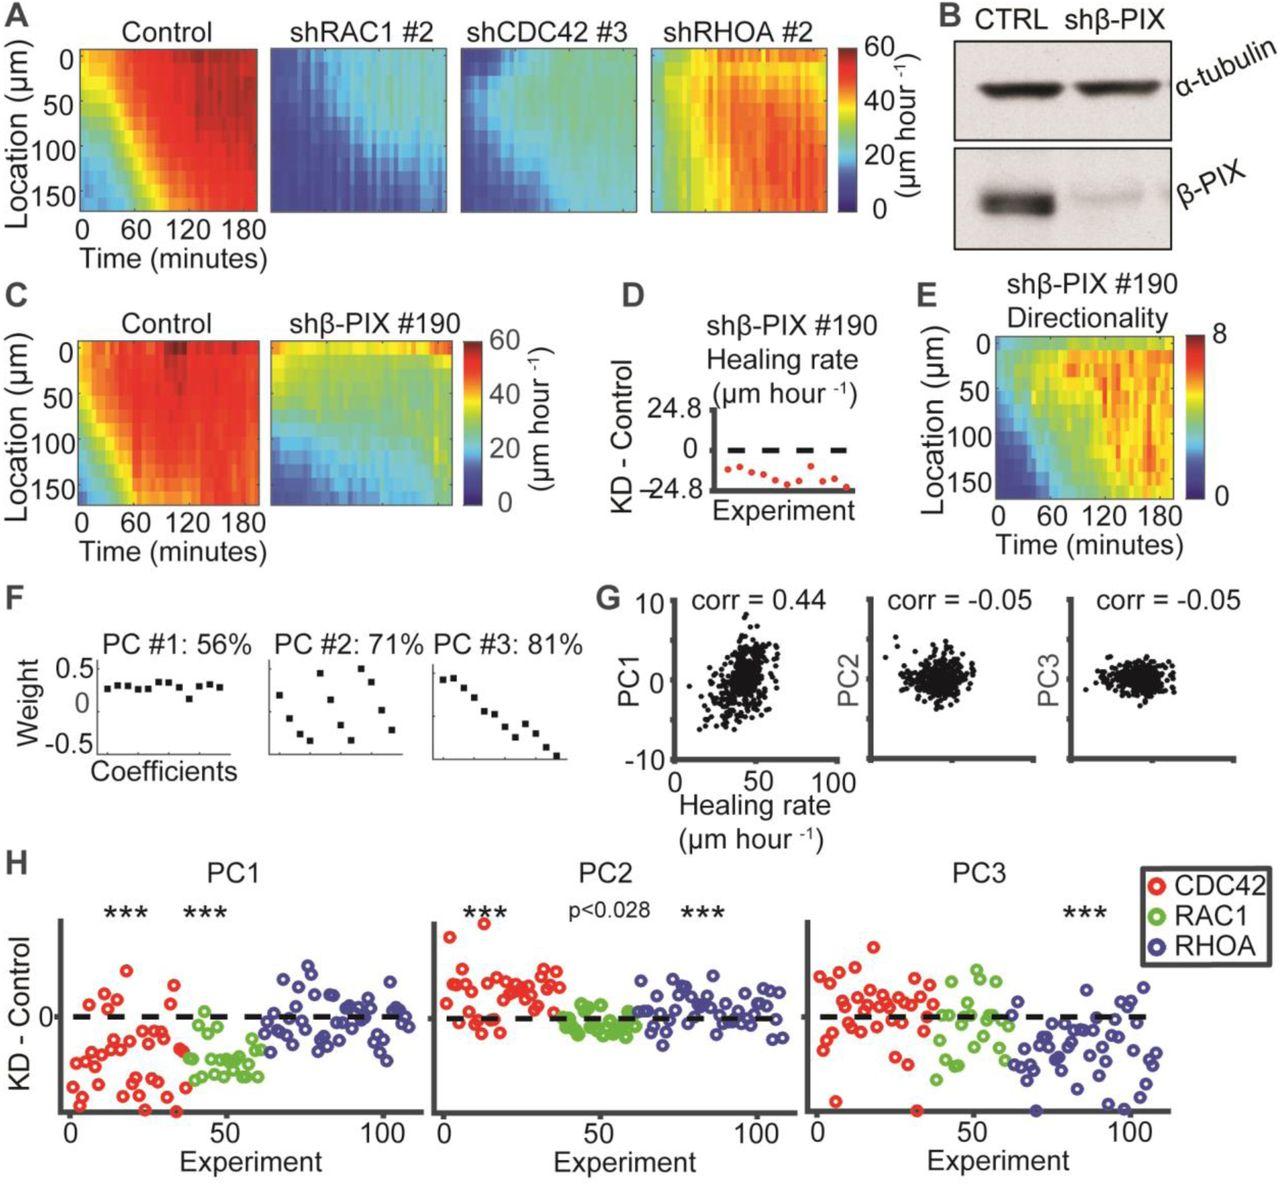 Diverse roles of guanine nucleotide exchange factors in regulating